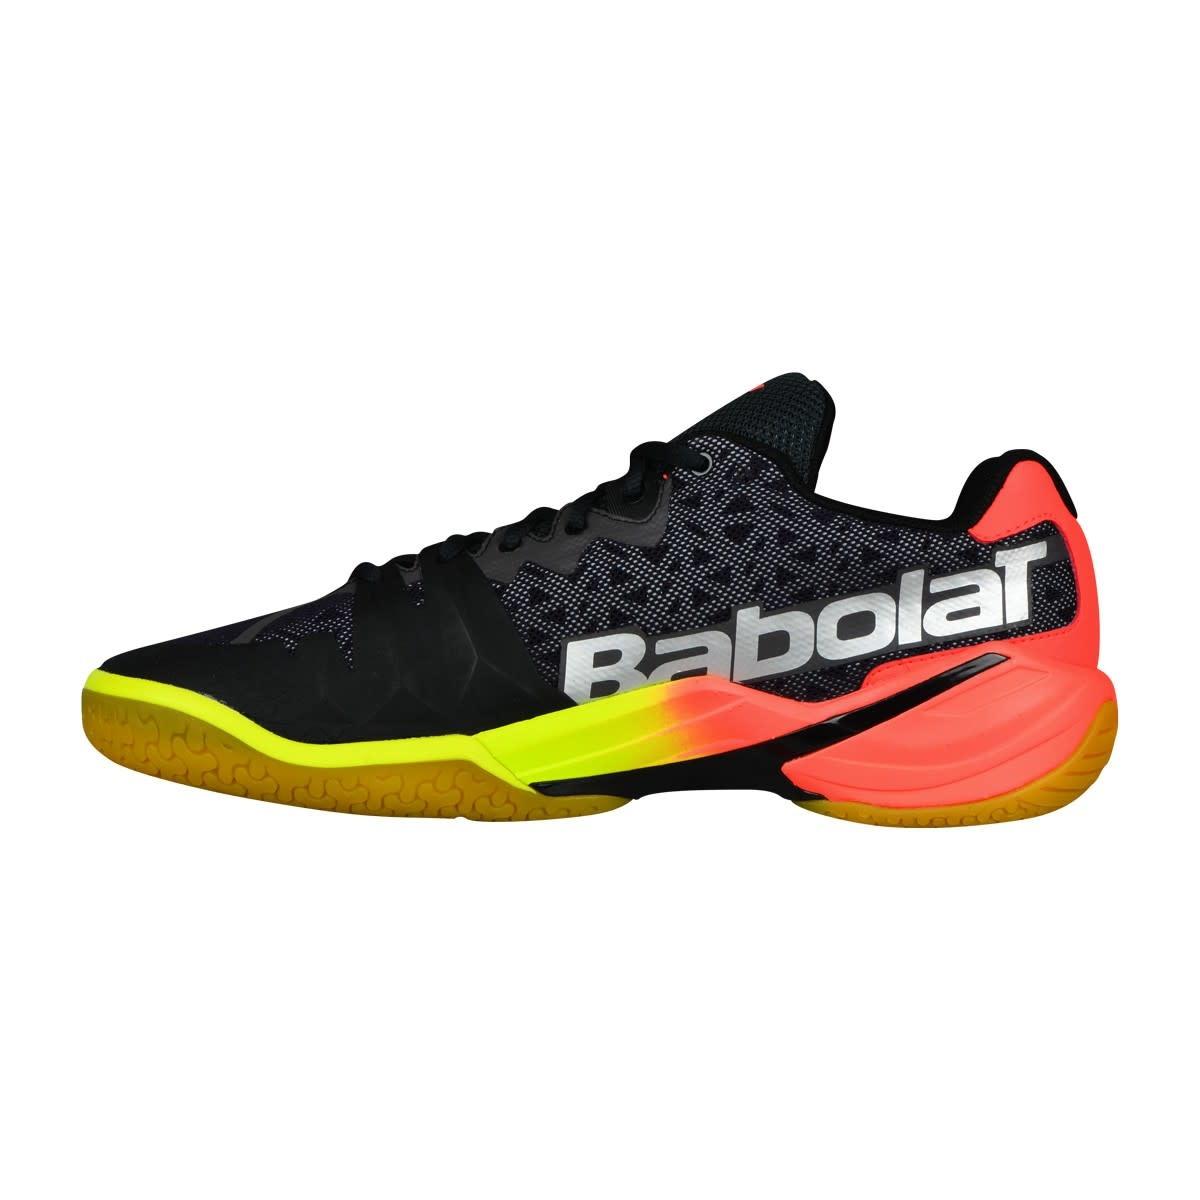 Babolat Babolat Shadow Tour Men 2018 Squash Shoes